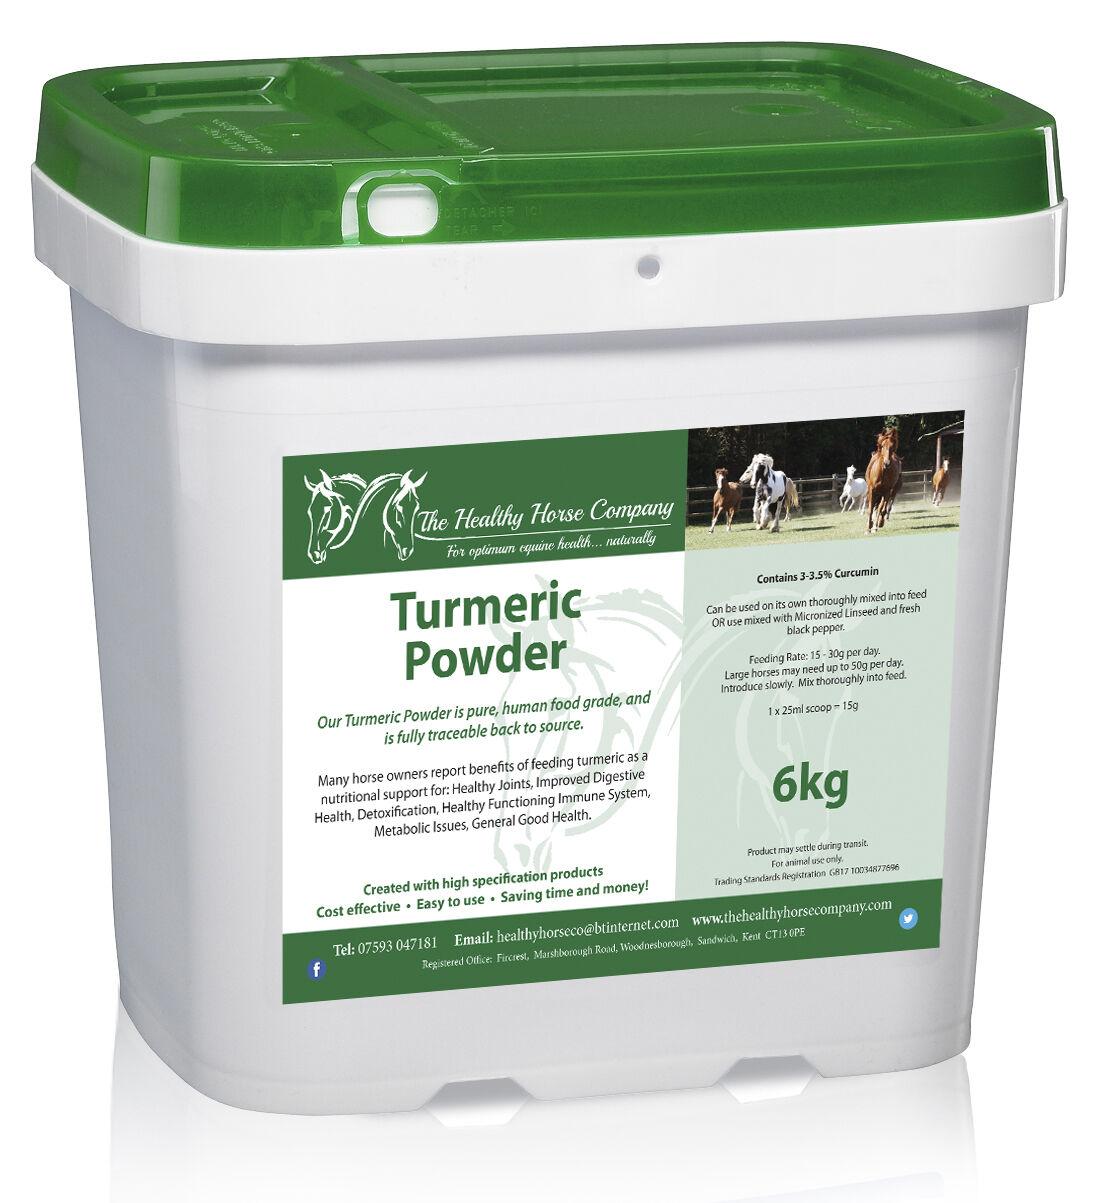 Turmeric Powder 6kg Tub - contains 3-3.5% Curcumin - (Digestion, Joints)